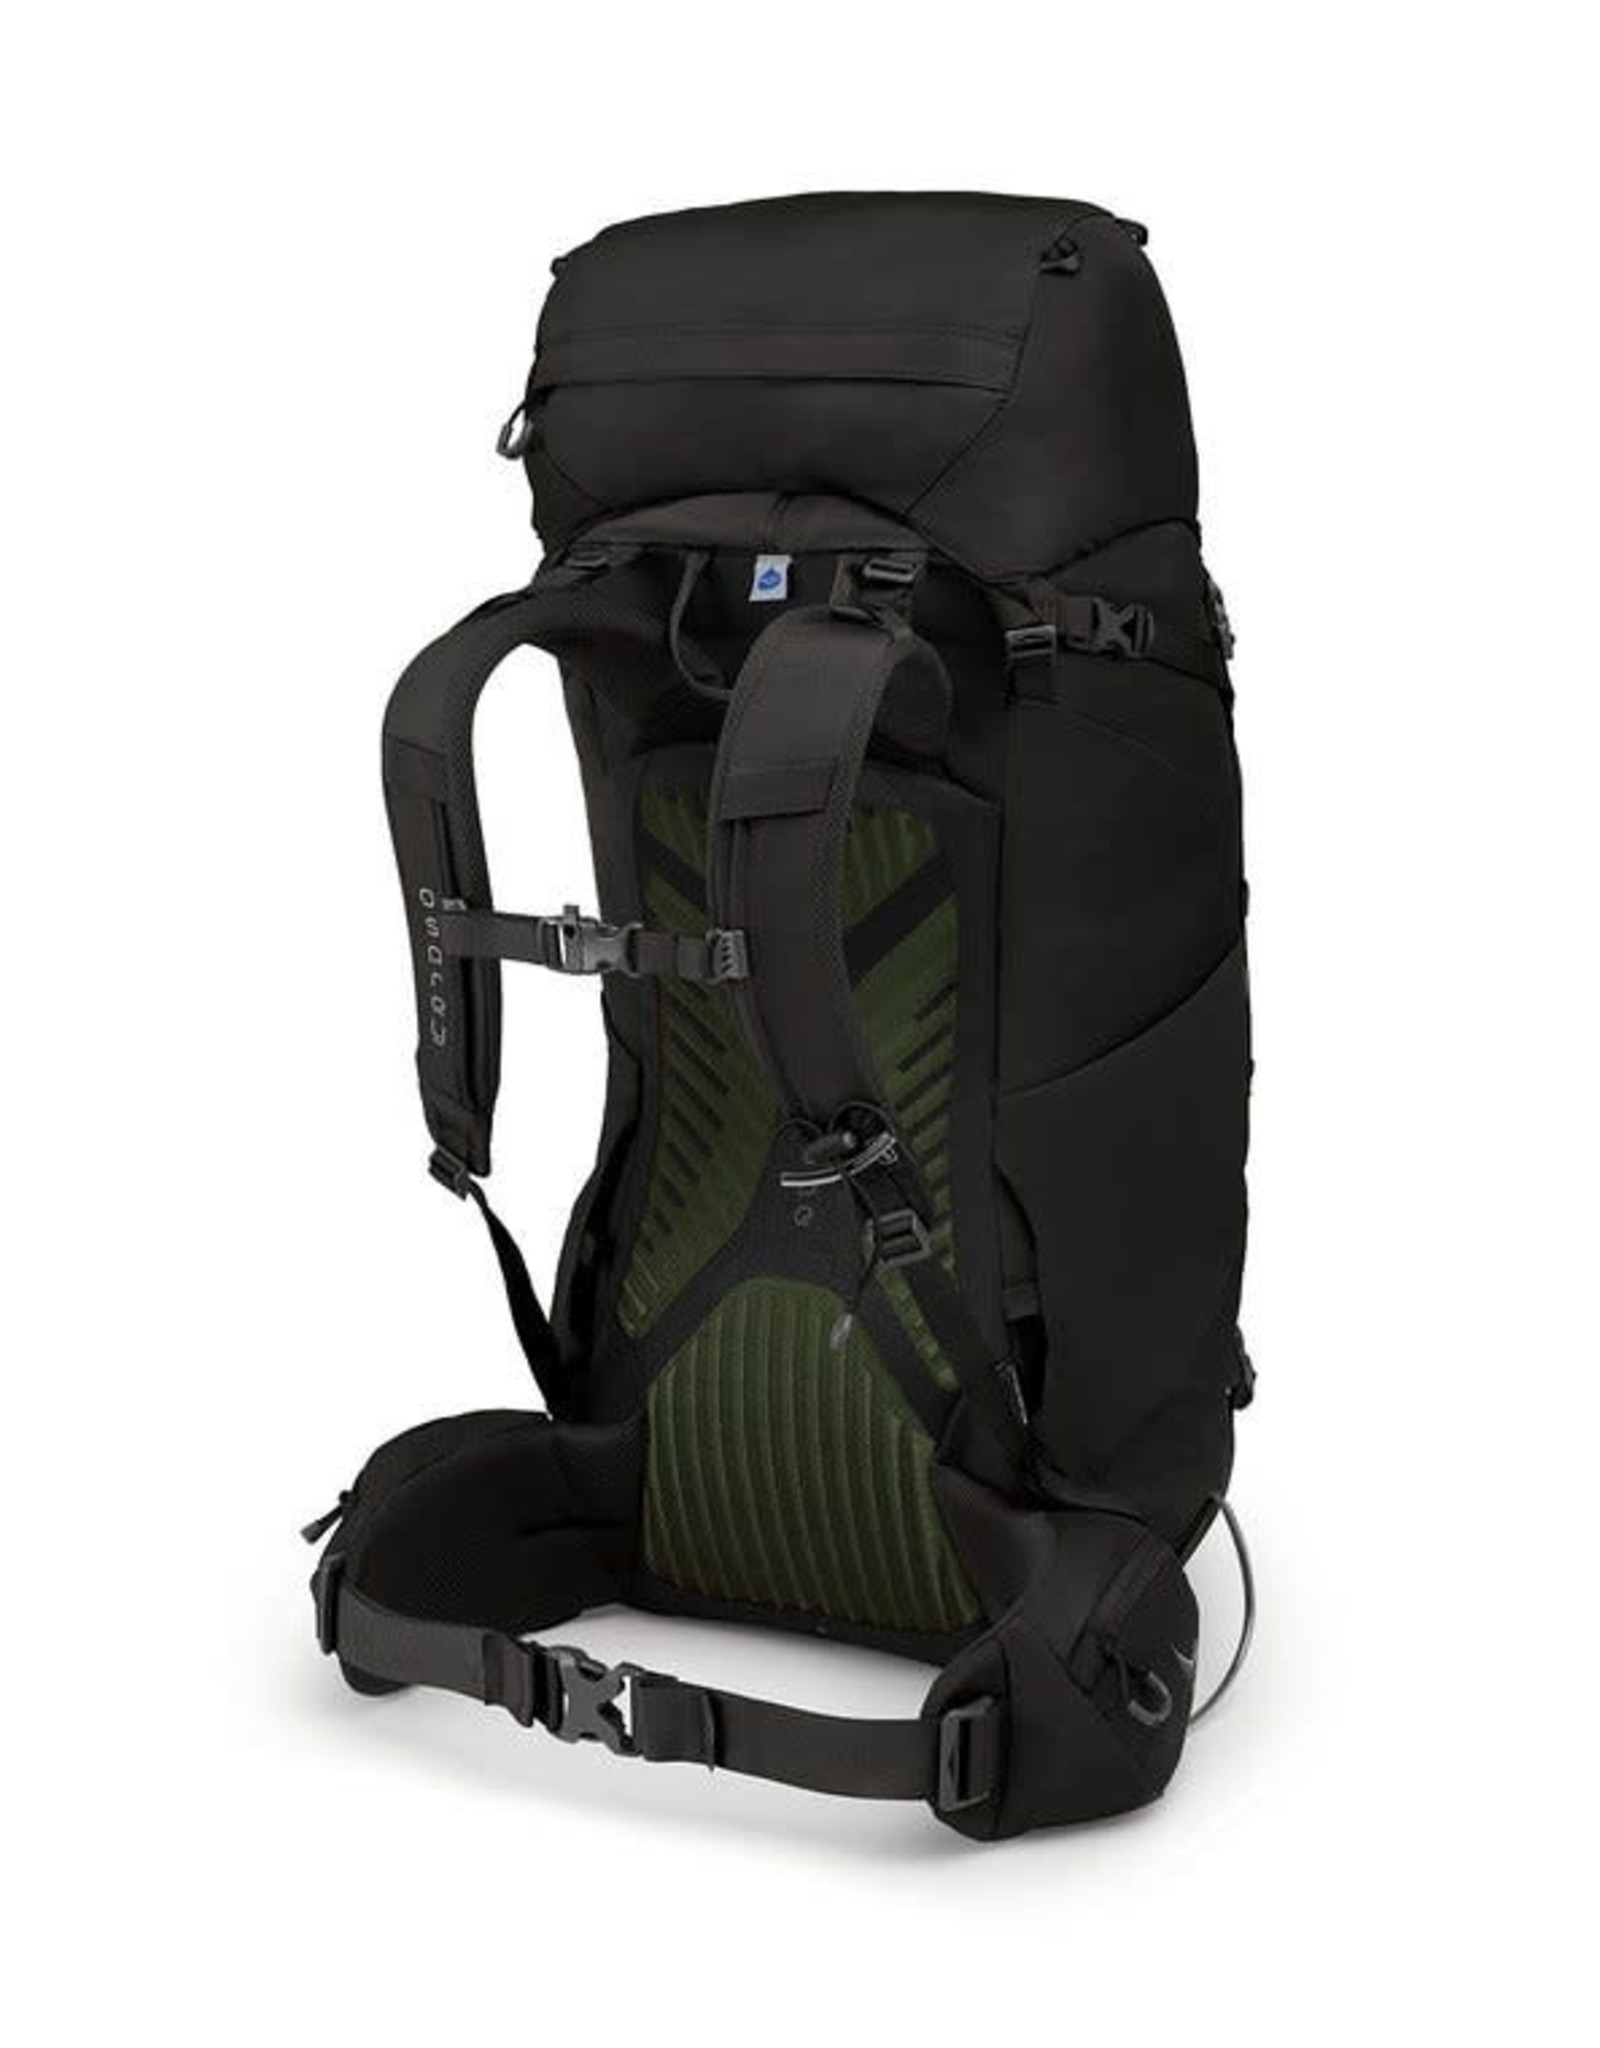 Osprey Kestrel 58 - Black